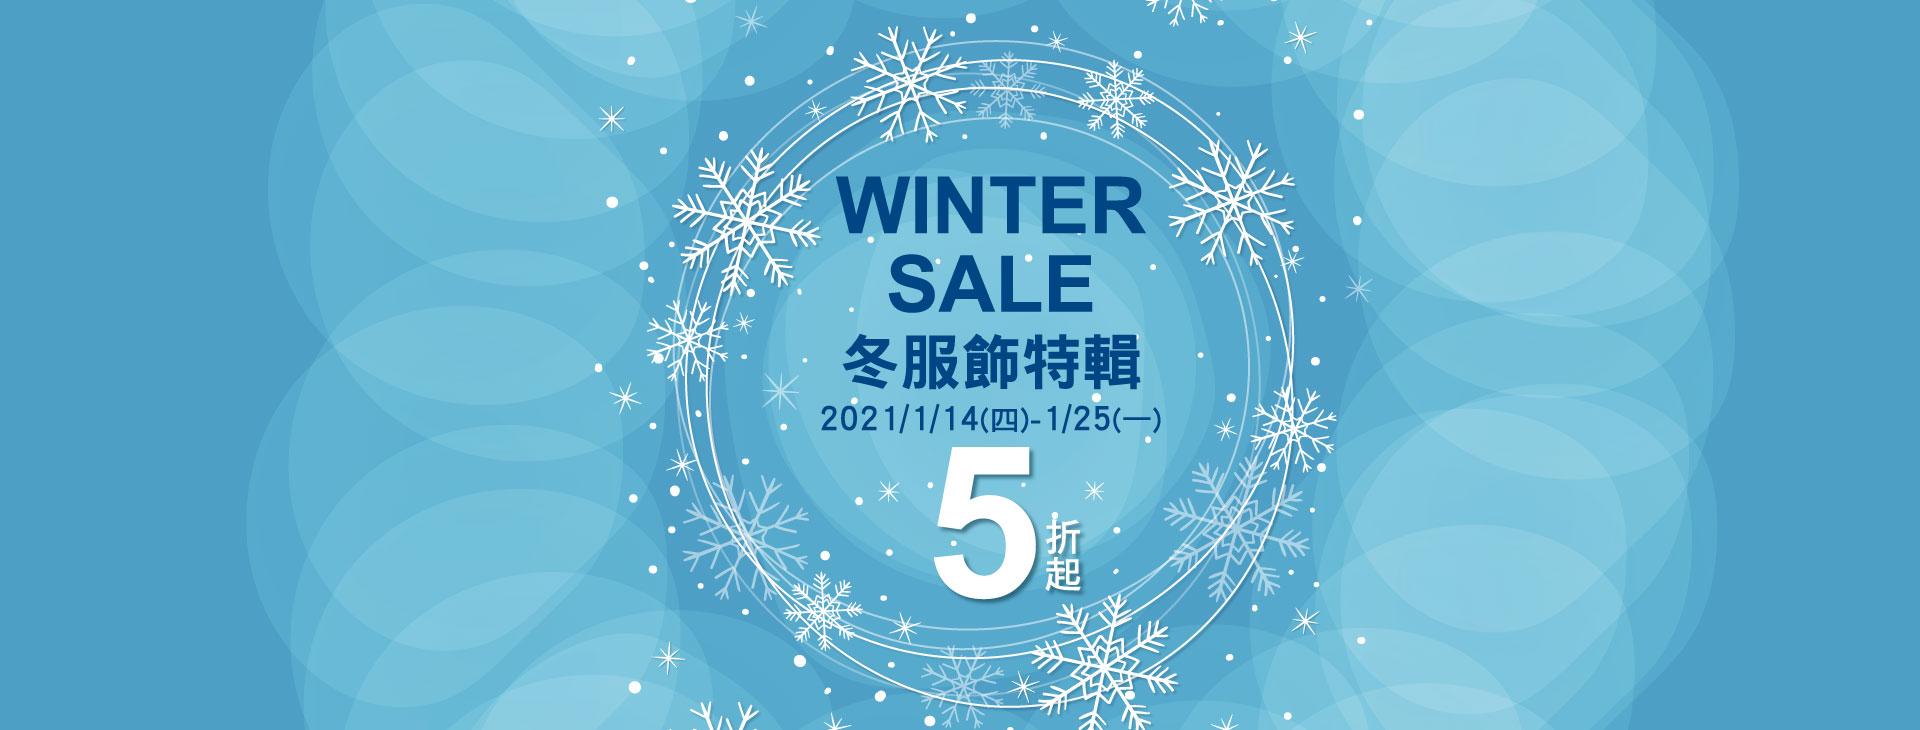 WINTER SALE 冬服飾特輯 5折起